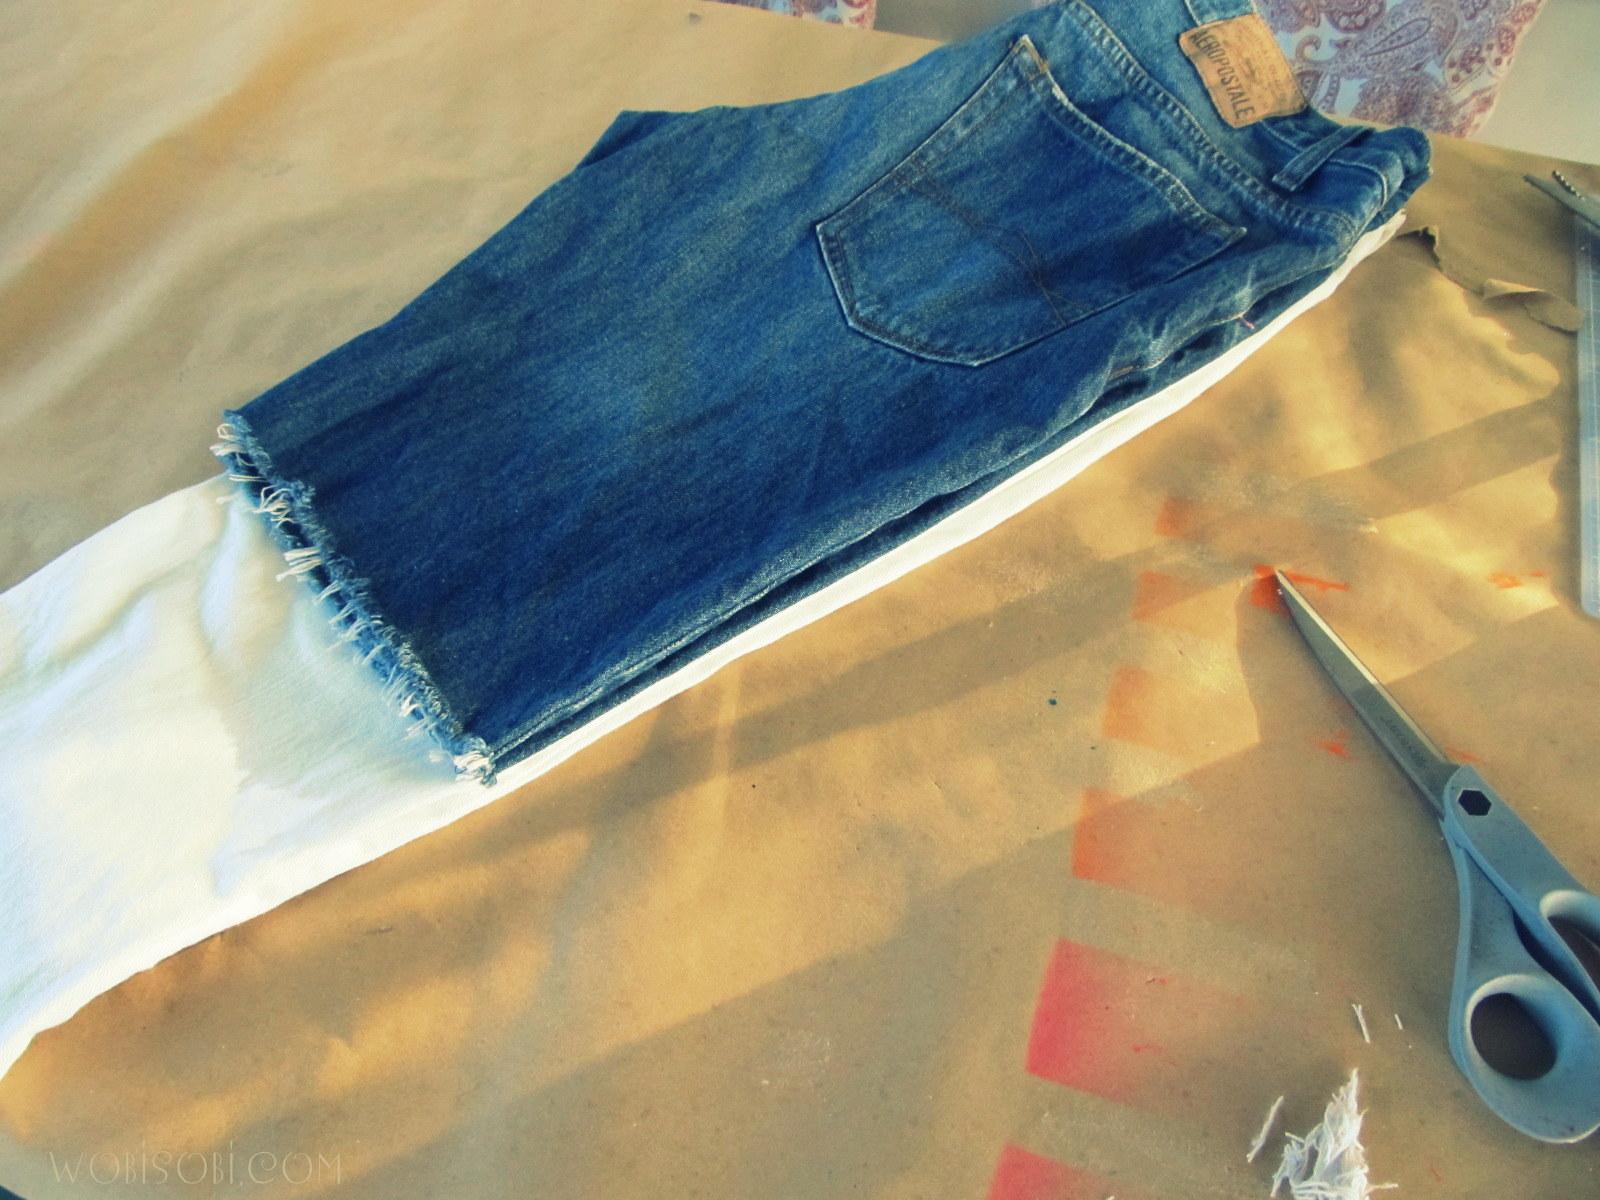 WobiSobi: Cut off Denim, Distressed Shorts, DIY